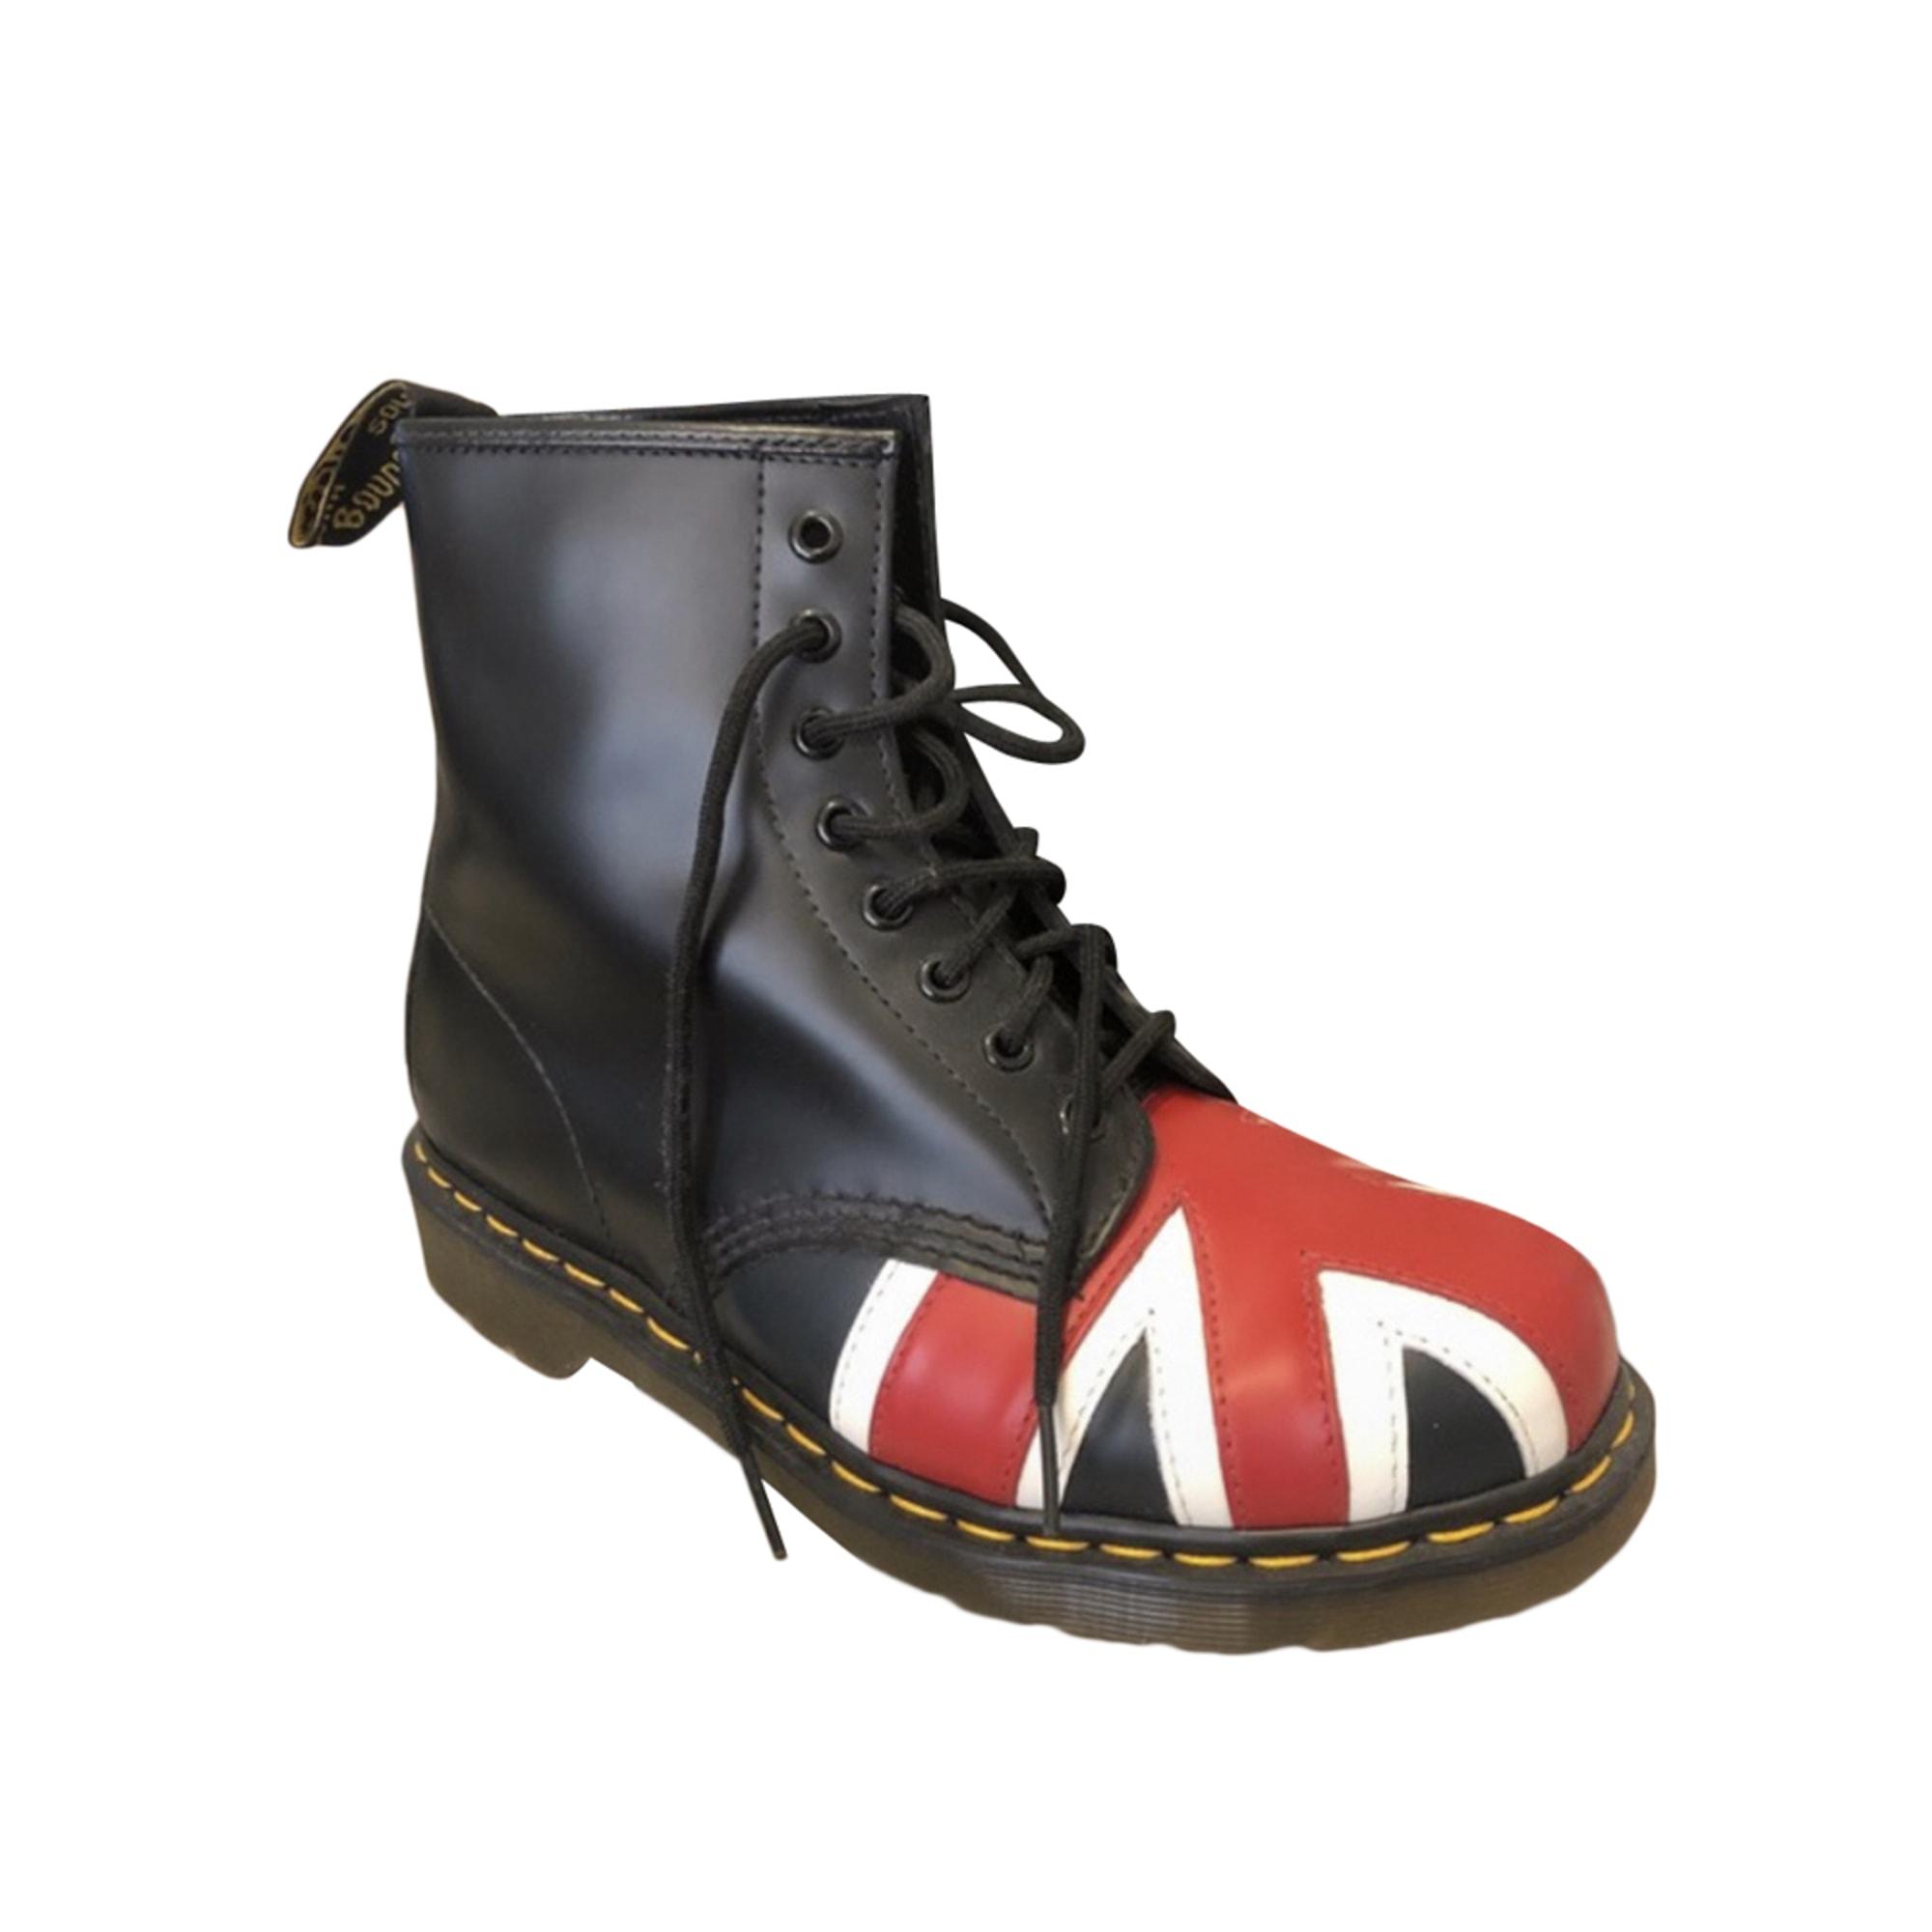 Recherche chaussures → Doc Martens. | Sims4Fr Communauté